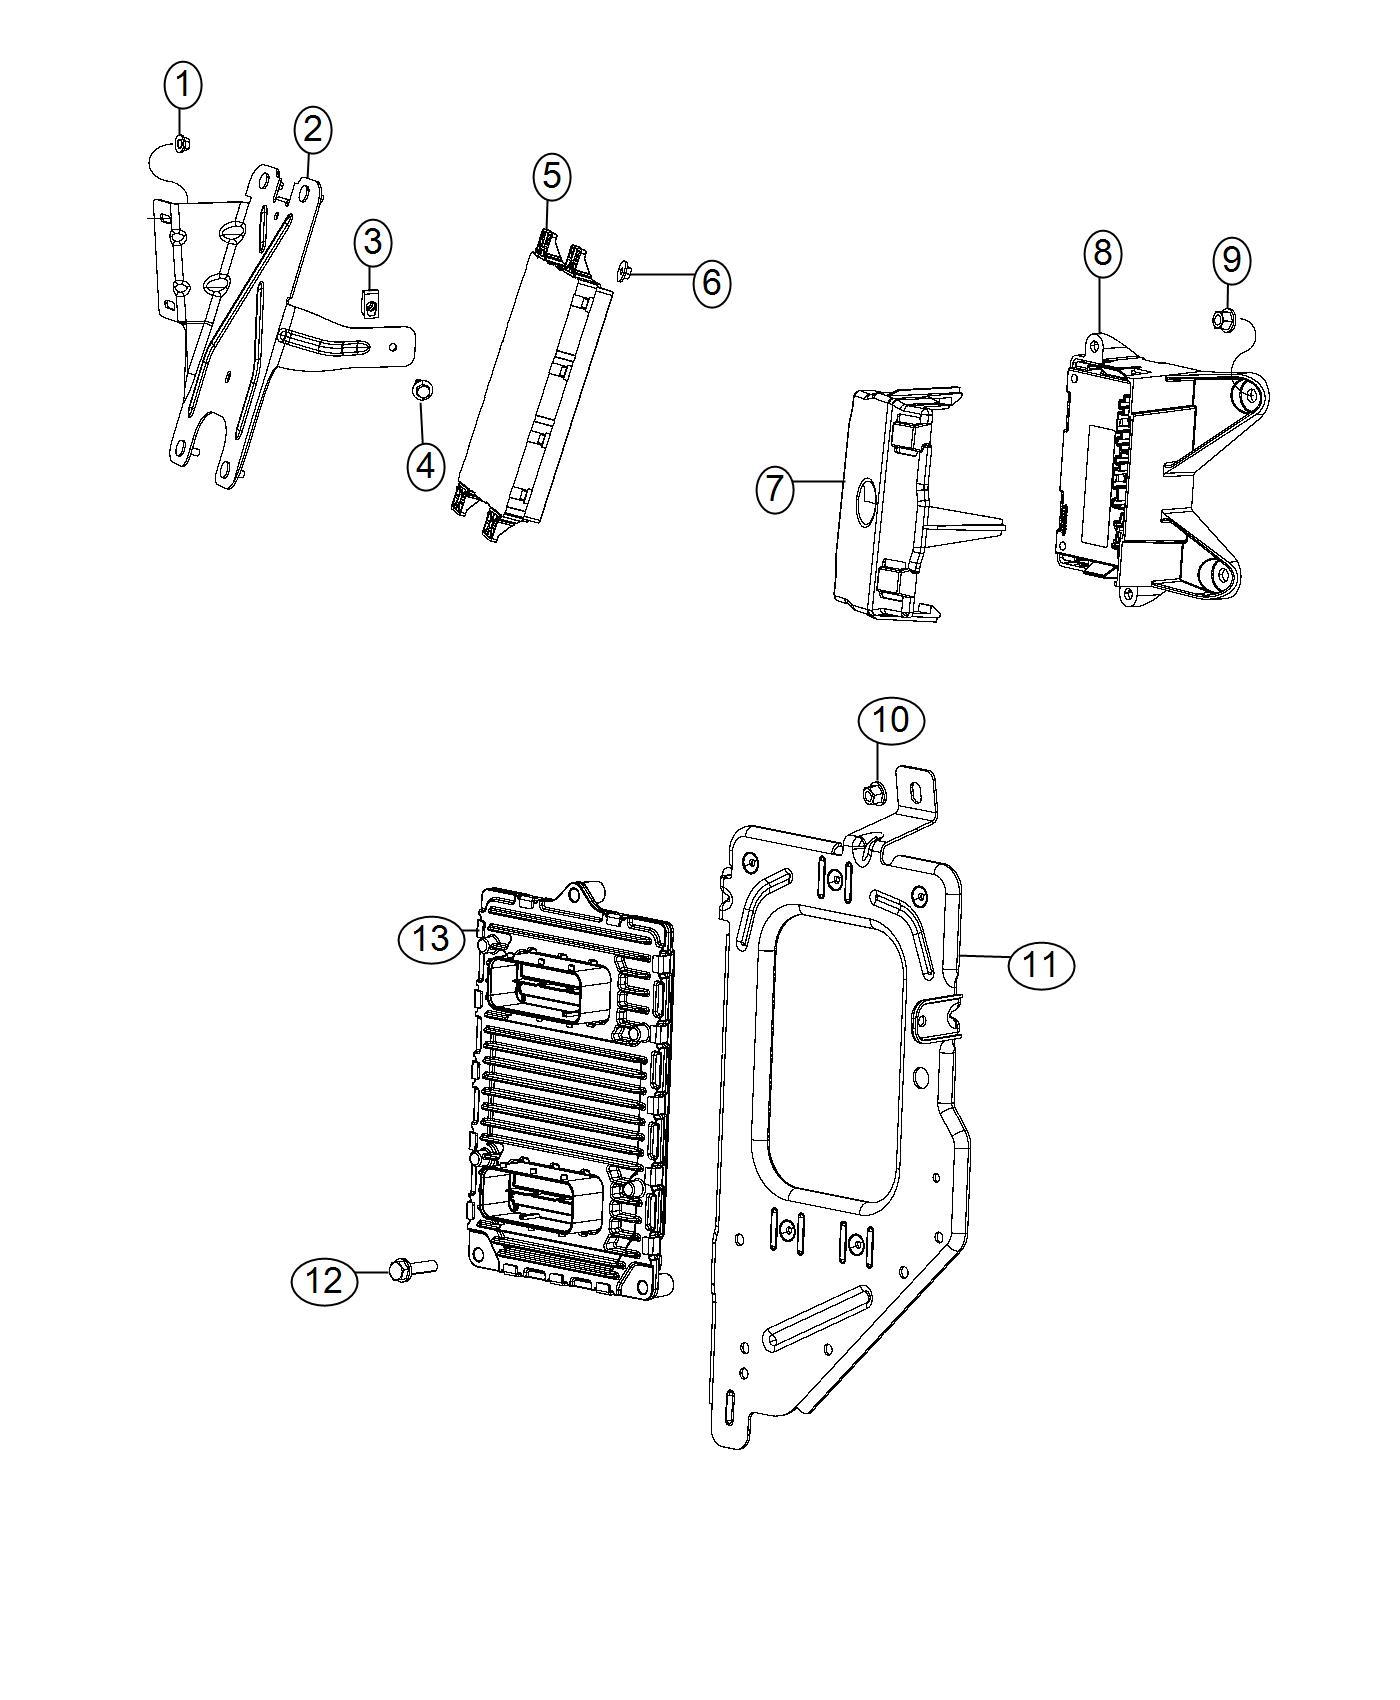 Ram Module Powertrain Control Generic Engine